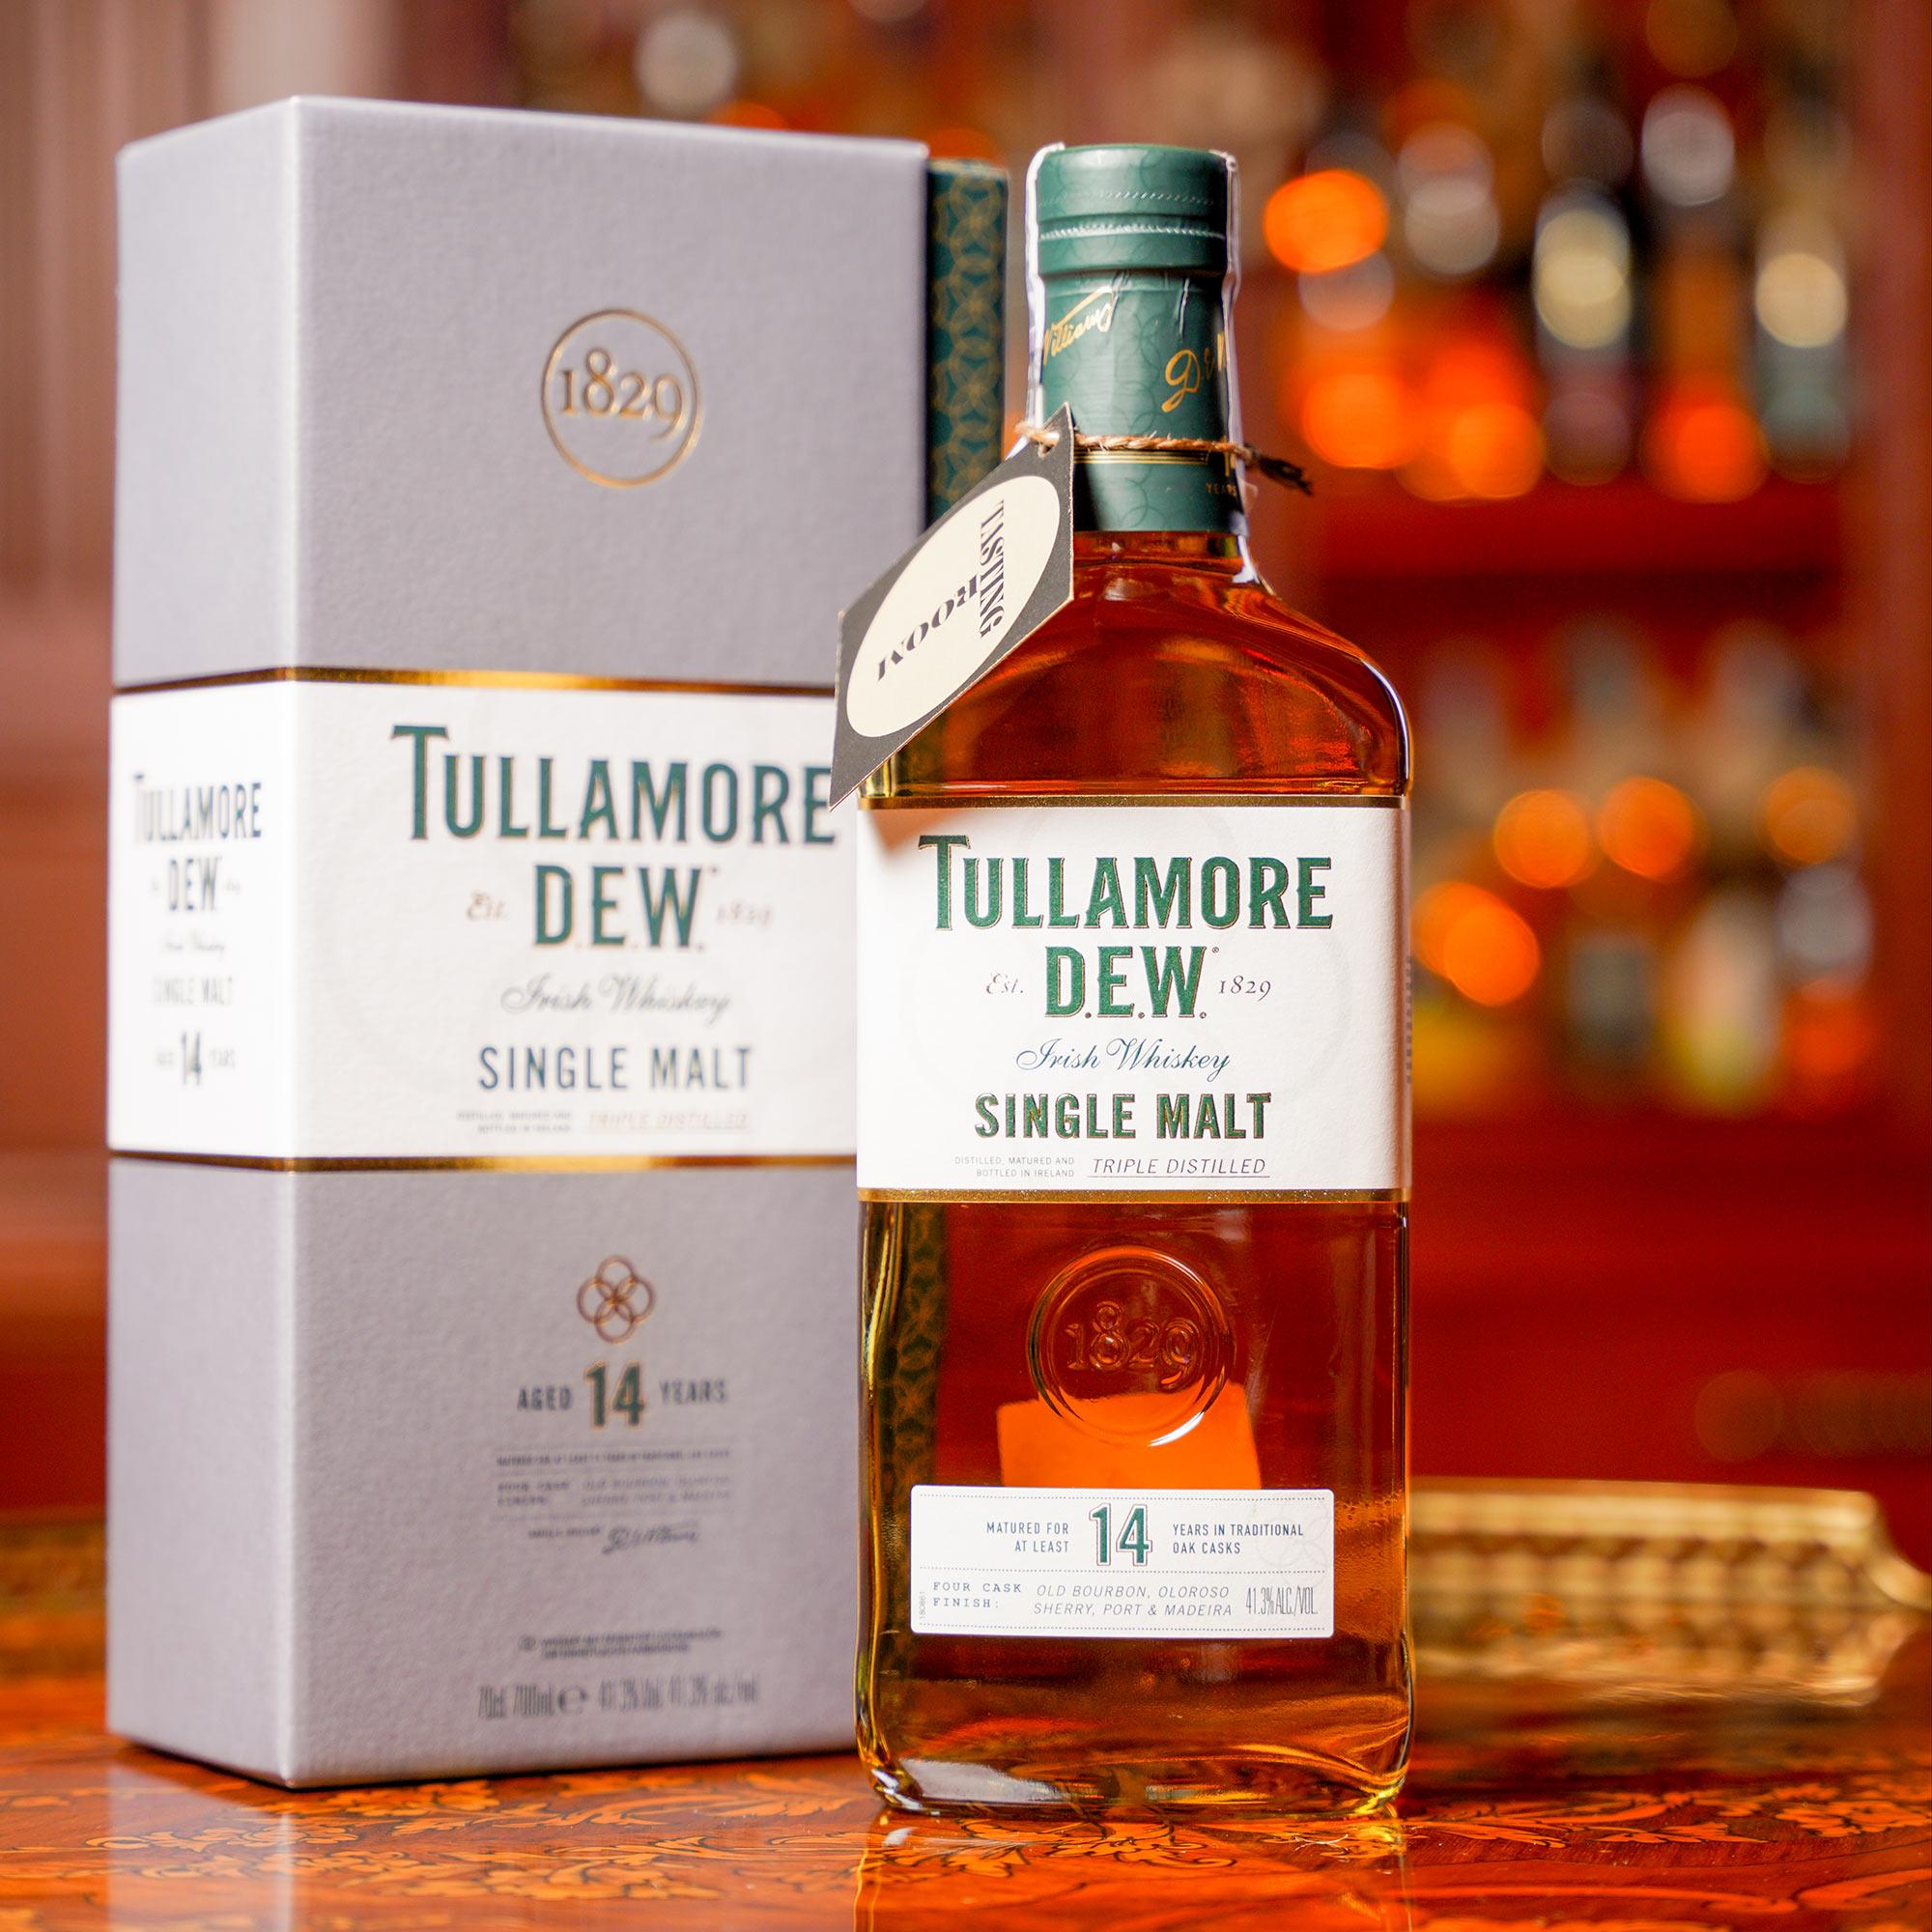 Tullamore DEW 14 YO /Тюламор Дю 14 годишен